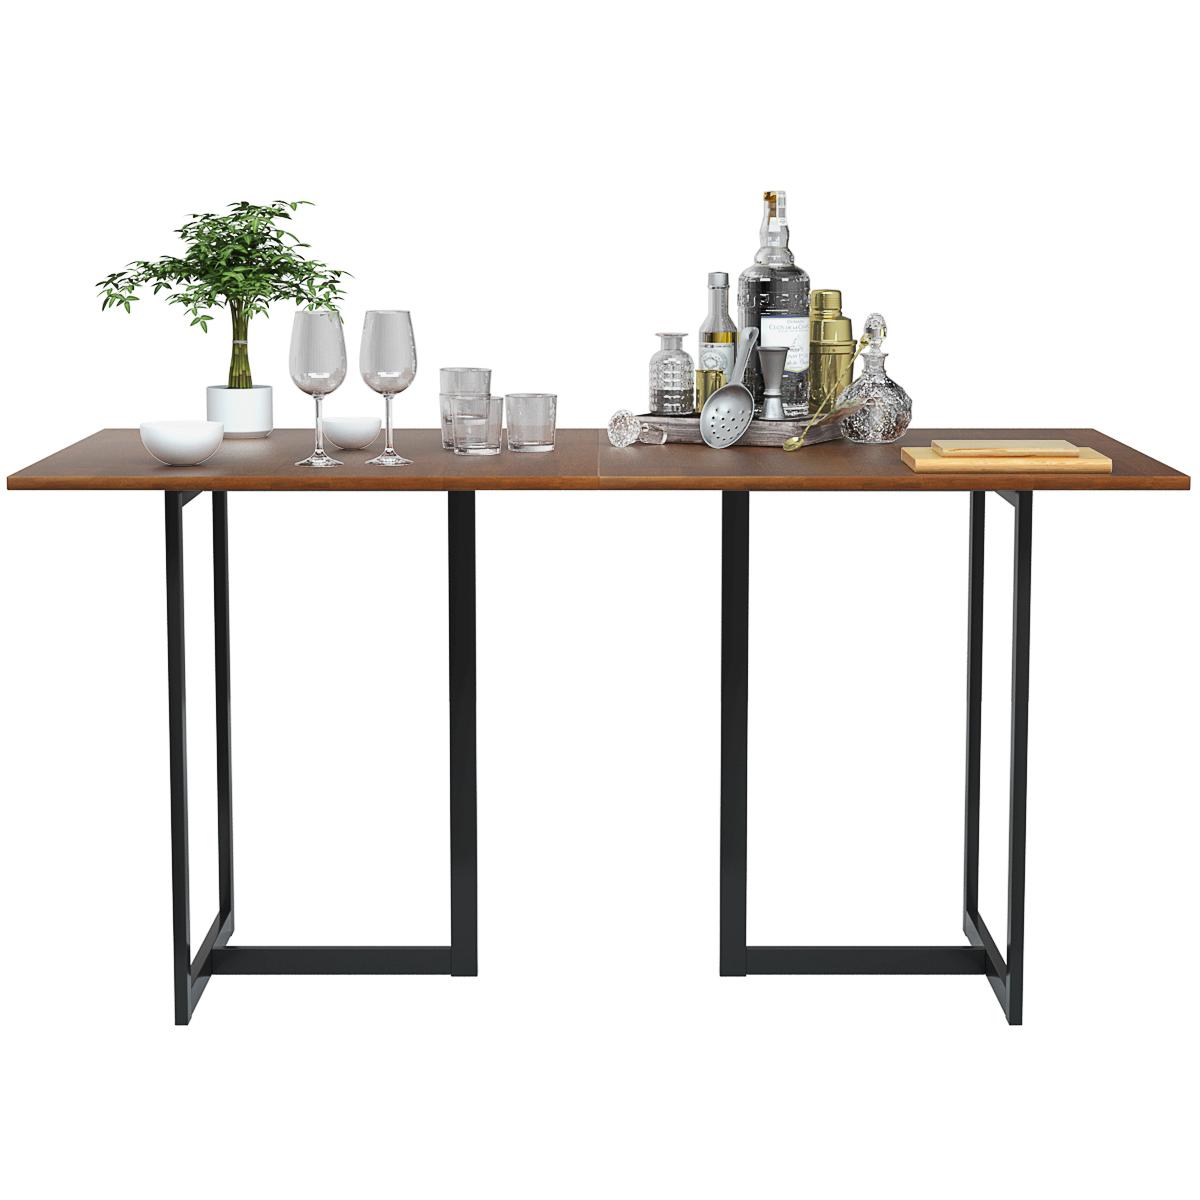 Rectangular Dining Table w/ Wooden Top Metal Frame Kitchen D